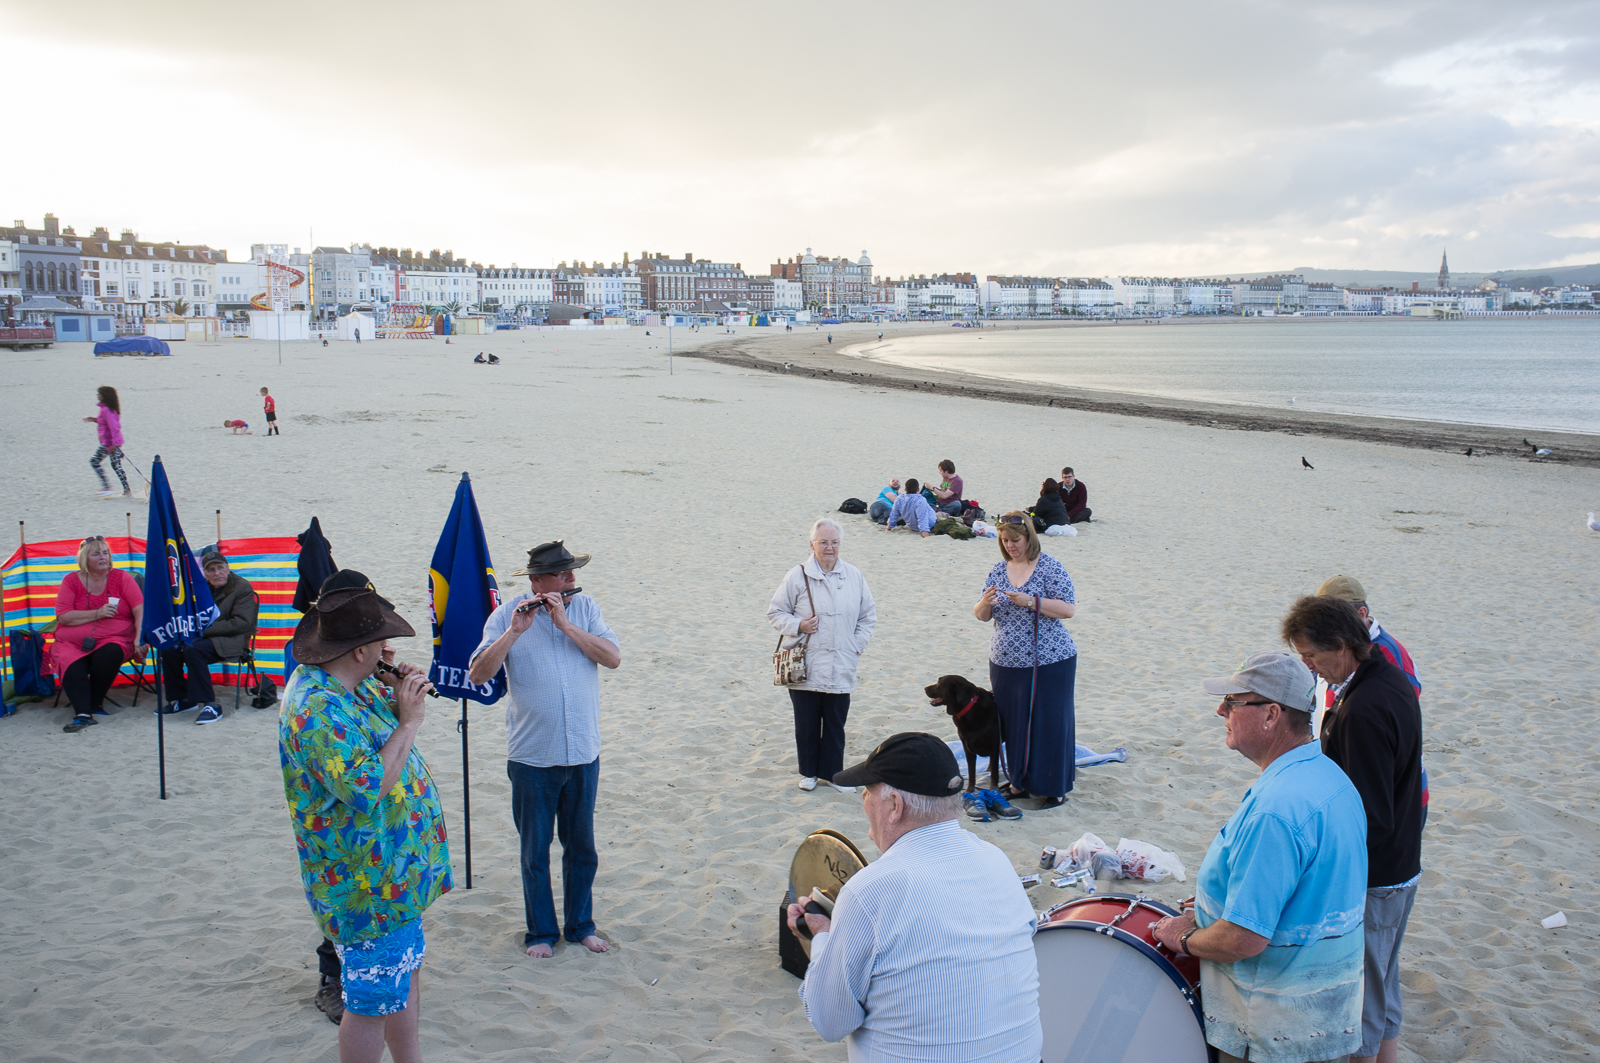 Weymouth on the beach